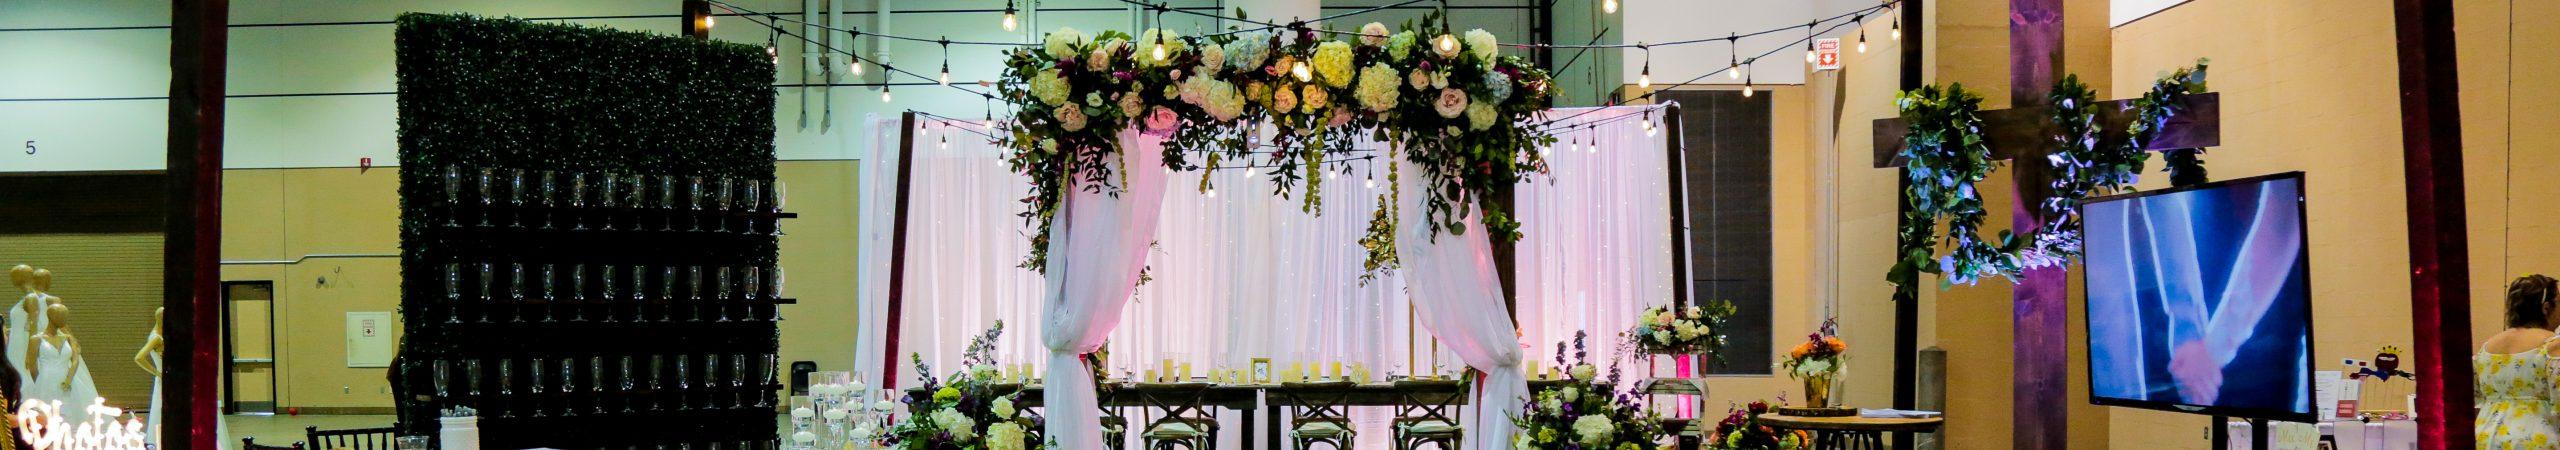 Premier Bridal Expo 2019